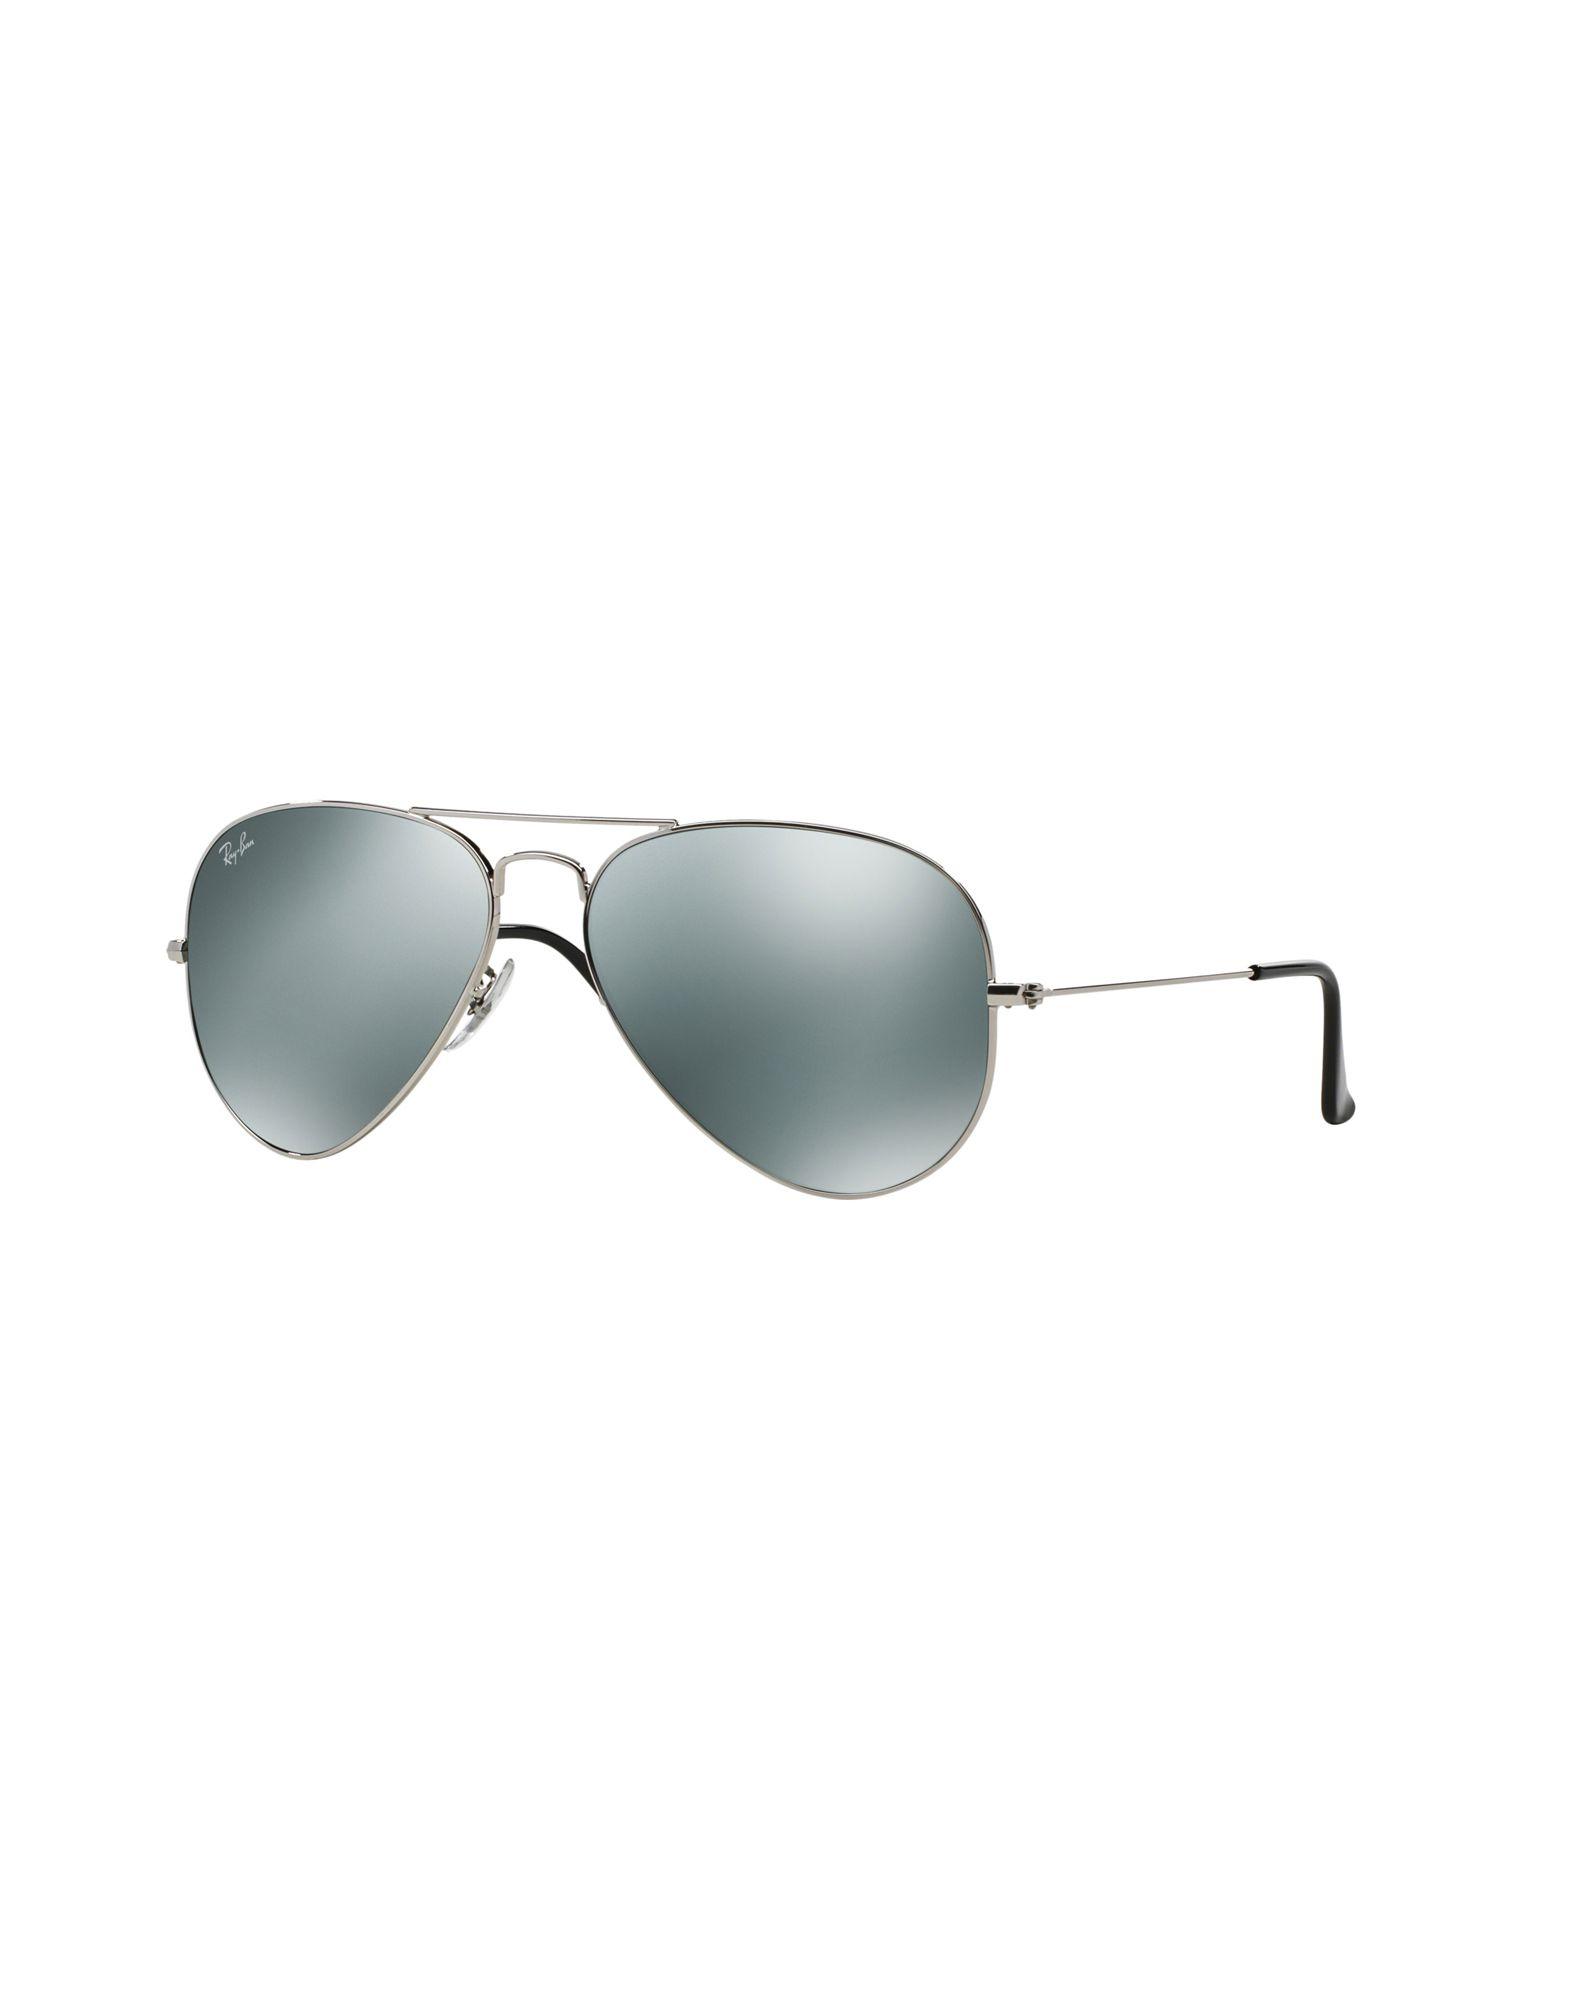 Occhiali Da Sole Ray-Ban Rb3025 Aviator Large Metal - Uomo - Acquista online su